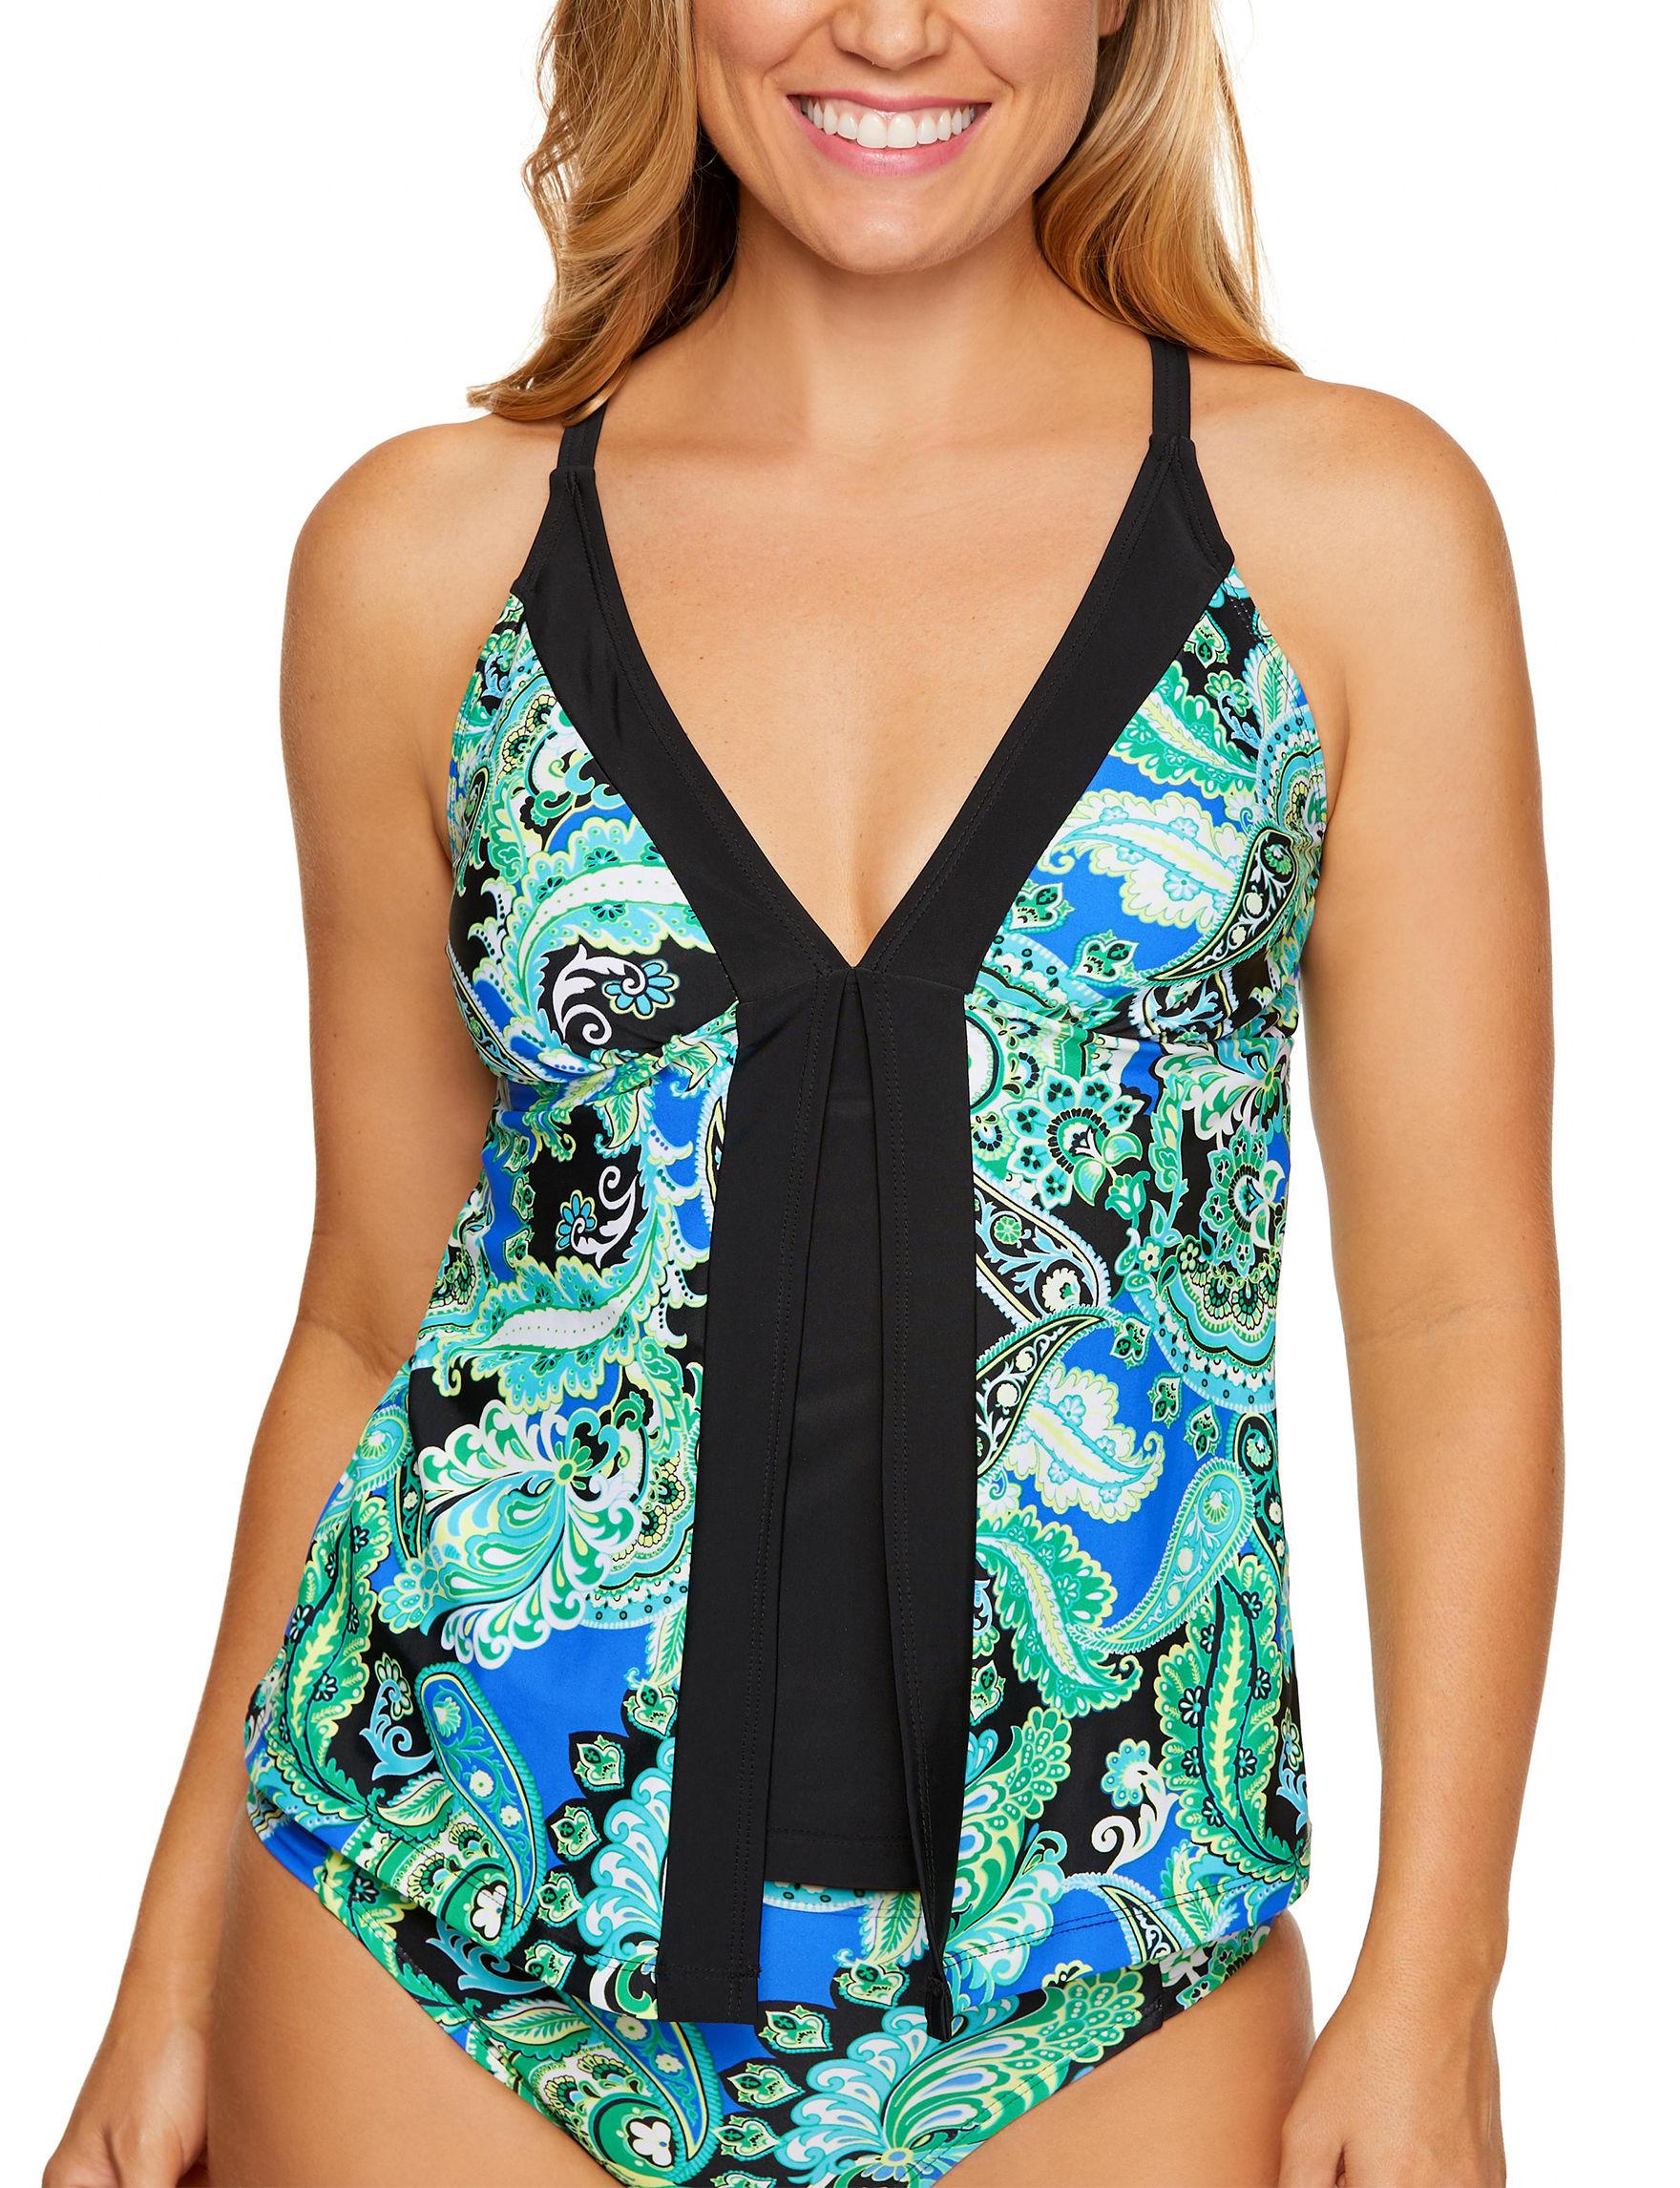 Beach Diva Black / Green Swimsuit Tops Tankini